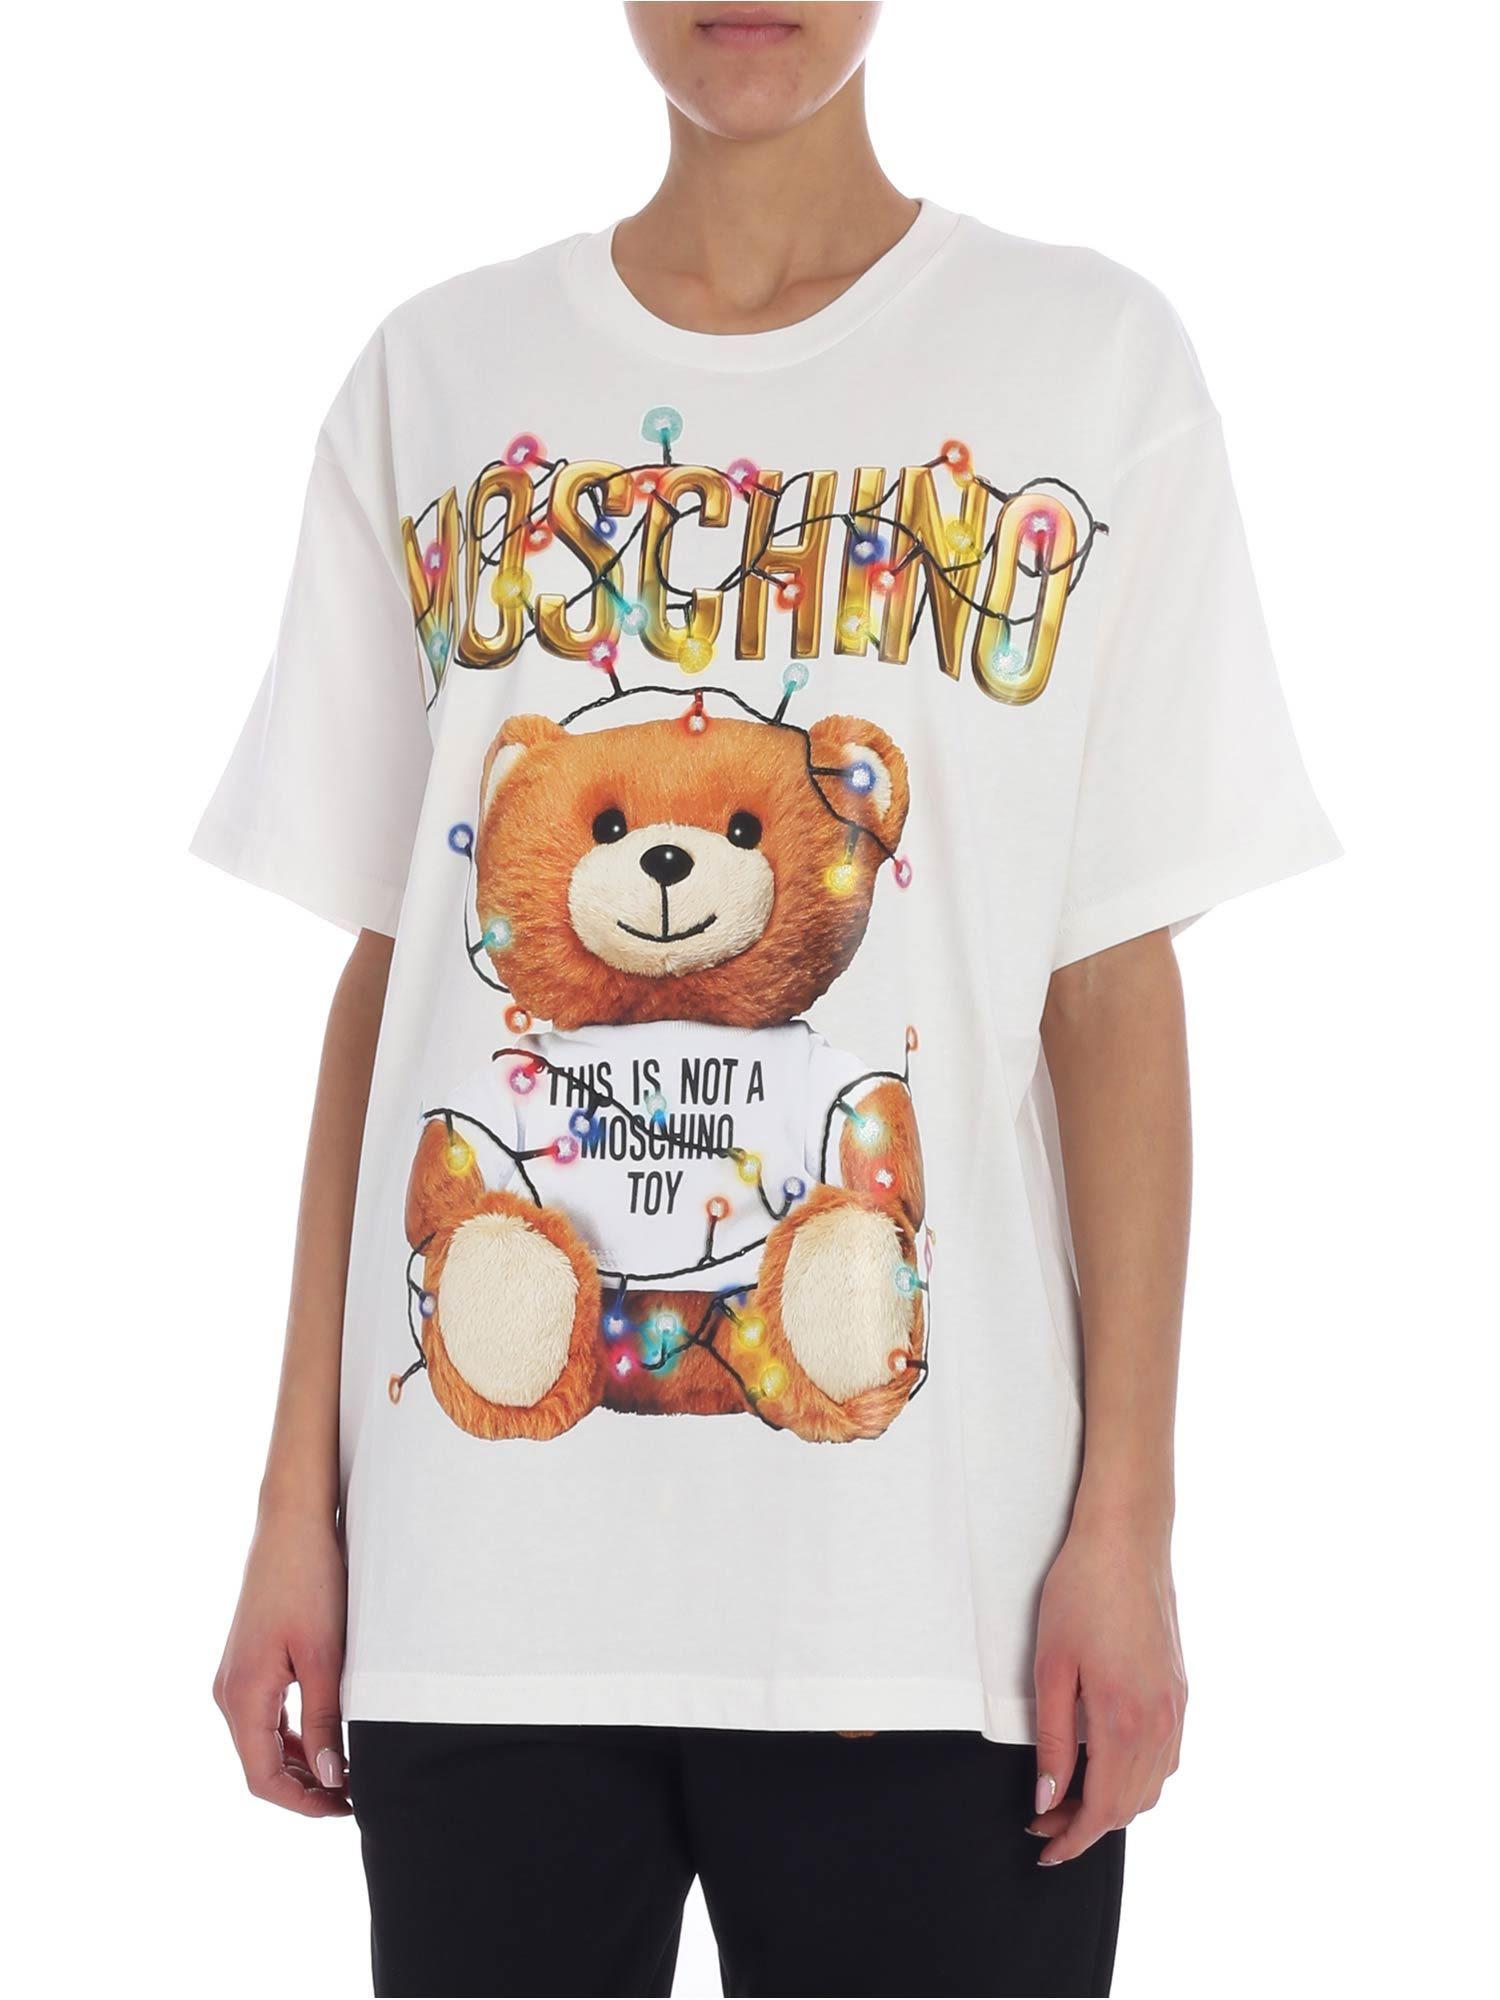 Moschino Teddy Holiday T-shirt